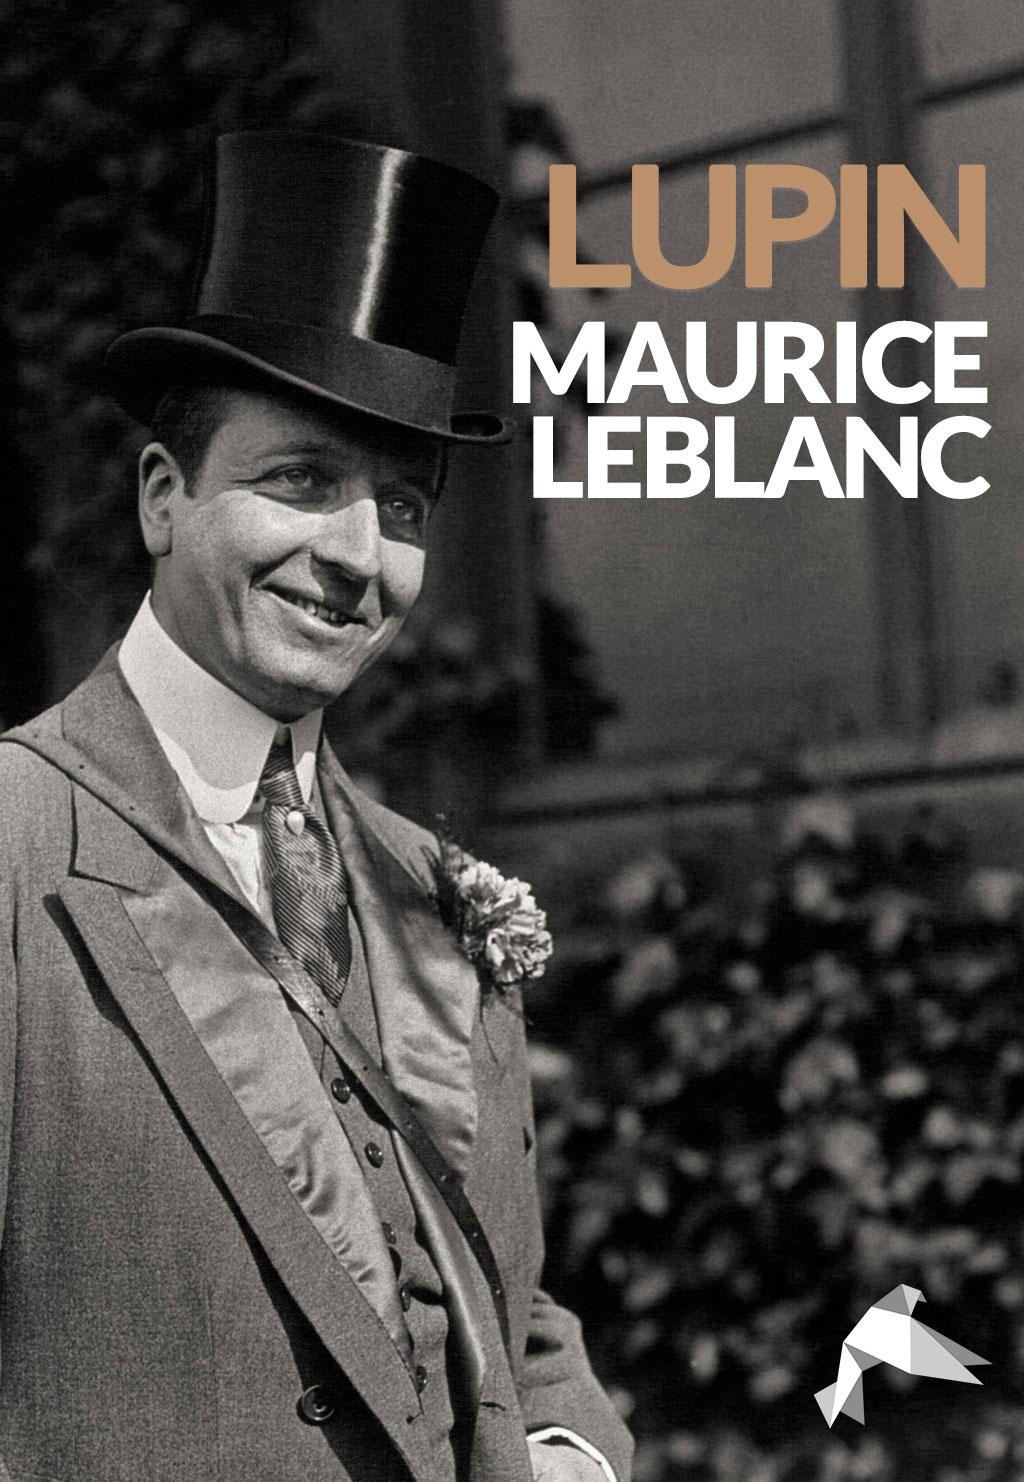 Lupin - Maurice Leblanc